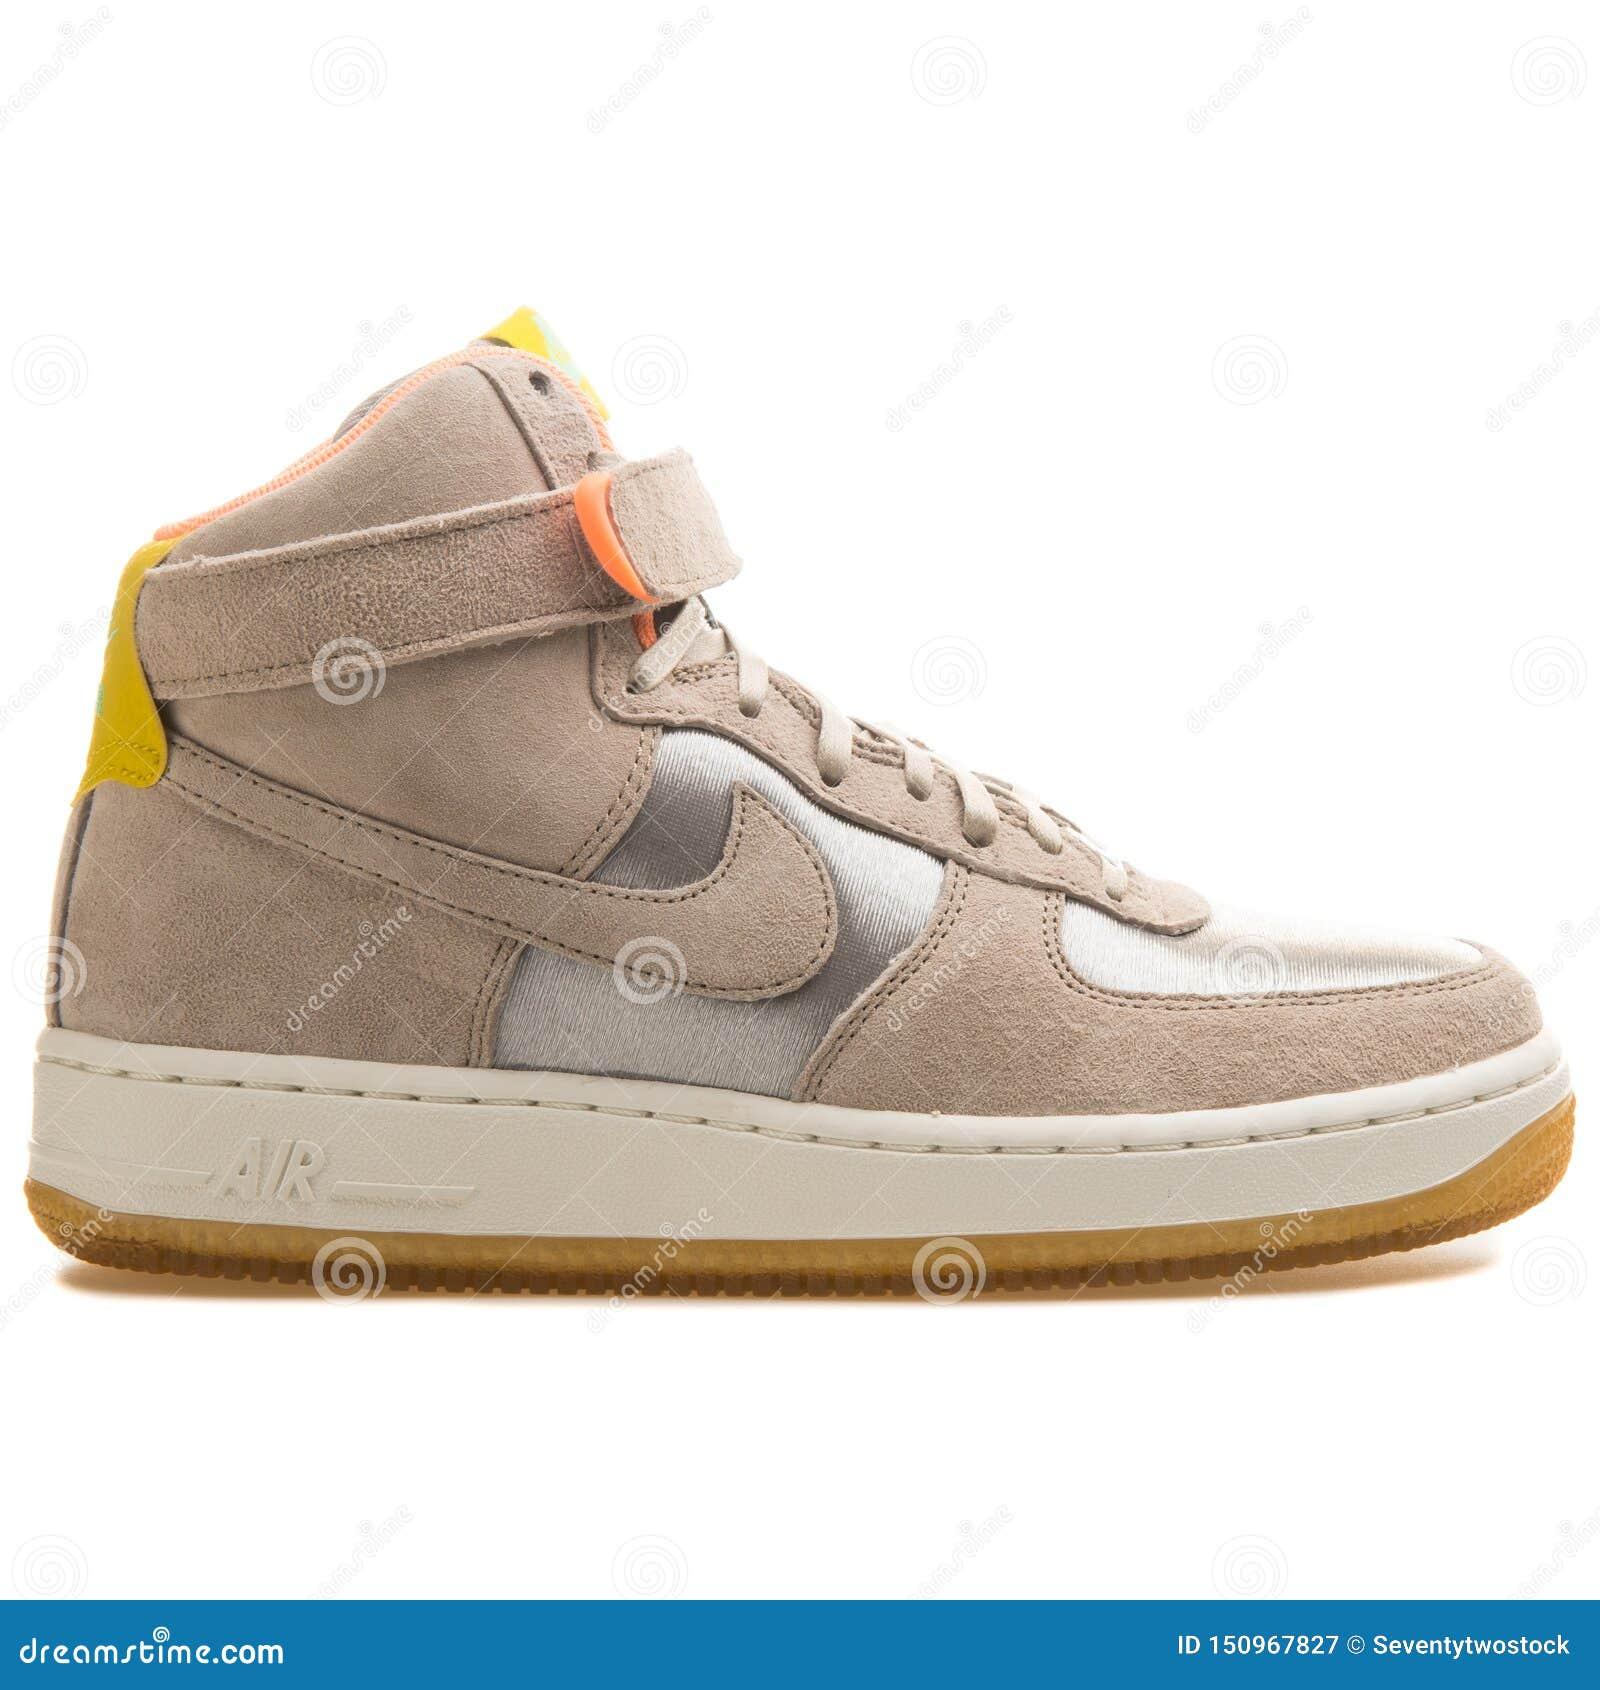 Pensar en el futuro resistencia Viaje  Nike Air Force 1 High Premium Beige And Metallic Silver Sneaker Editorial  Photography - Image of life, nike: 150967827